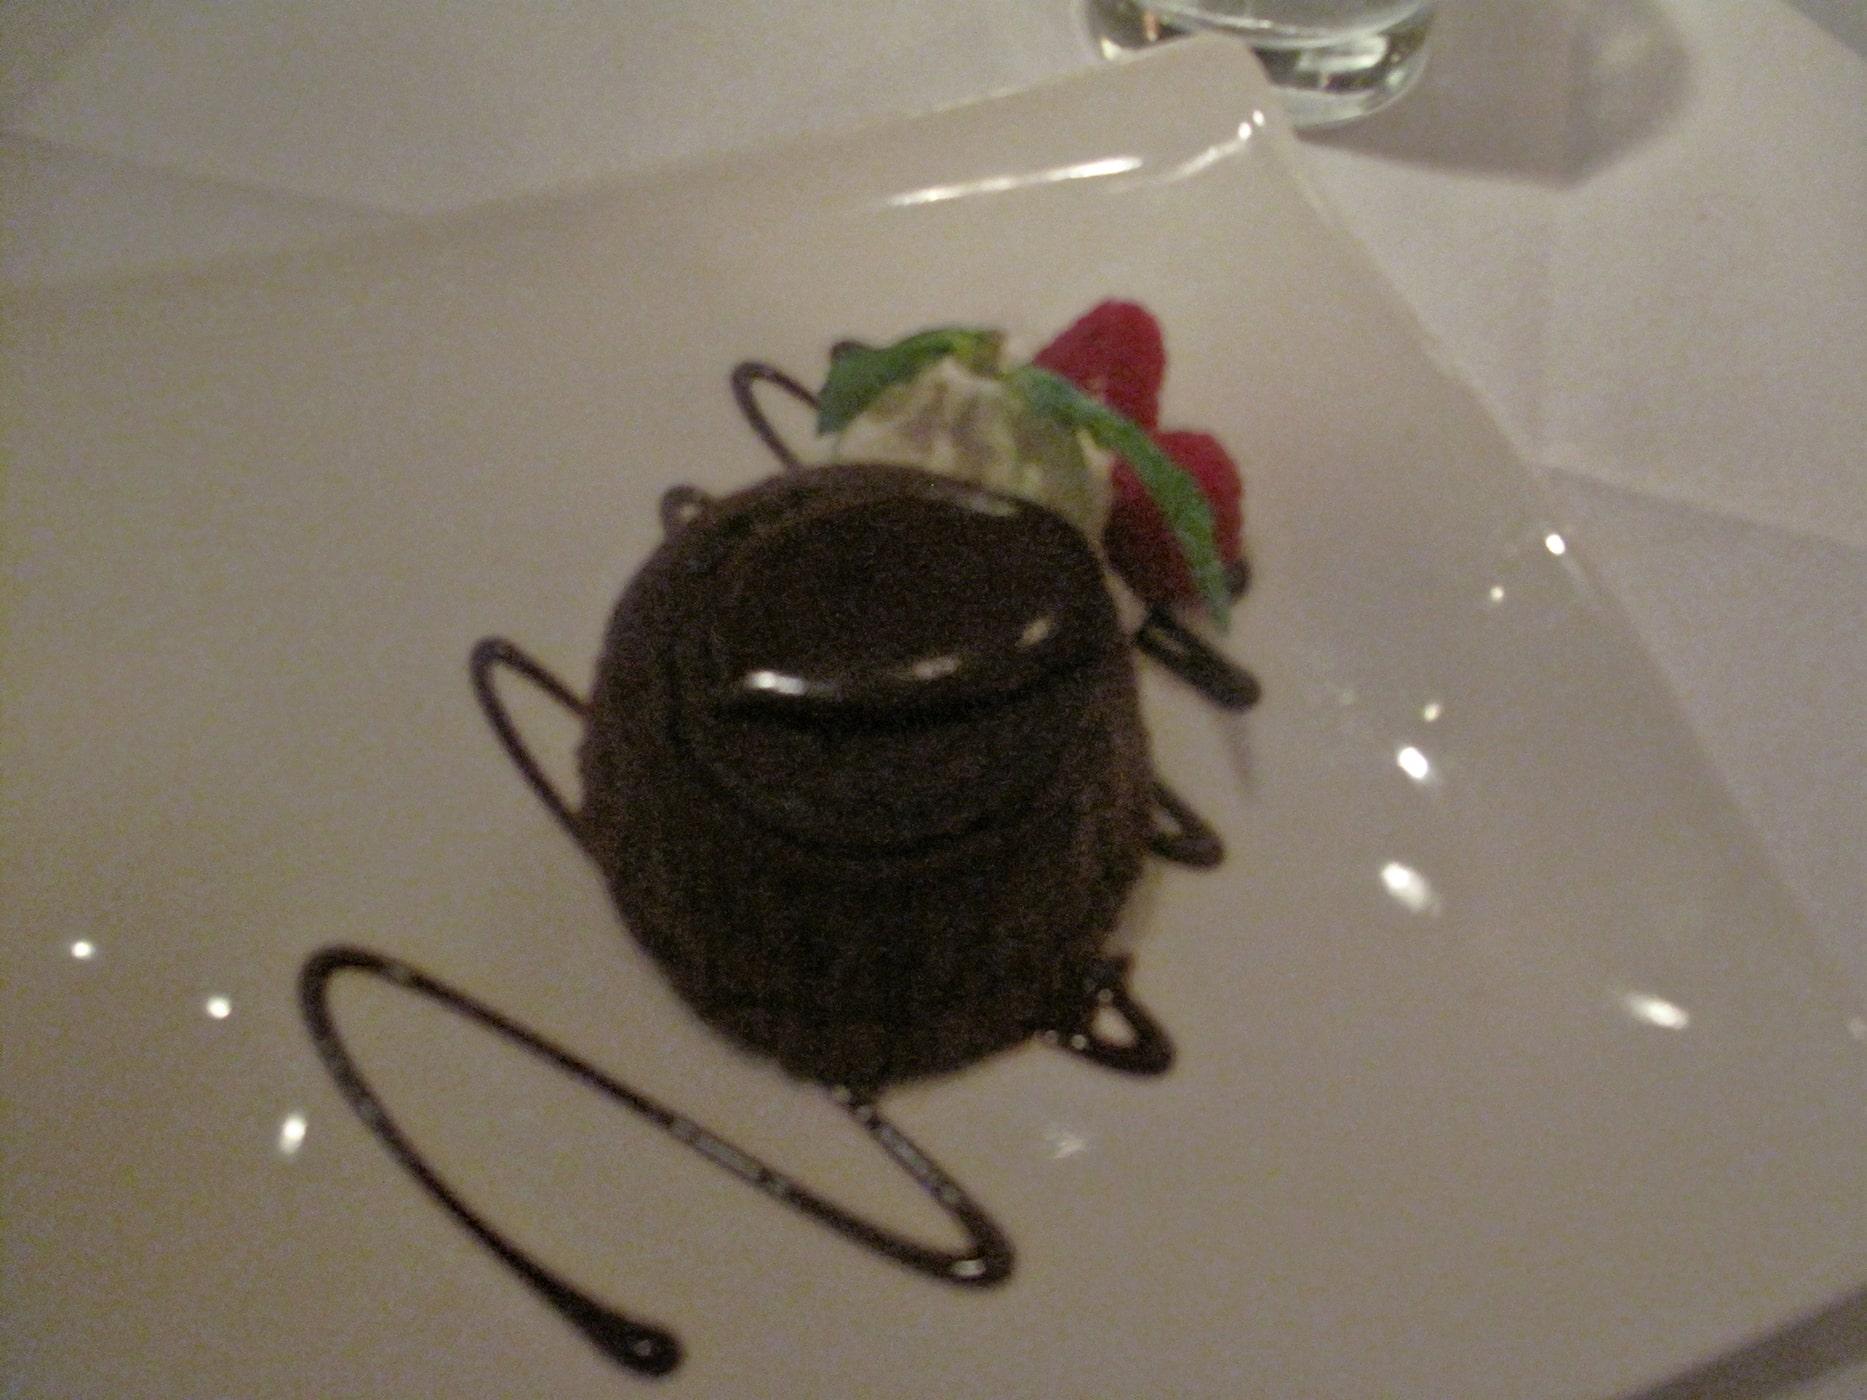 Restaurant week at Trattoria No 10 - chocolate cake